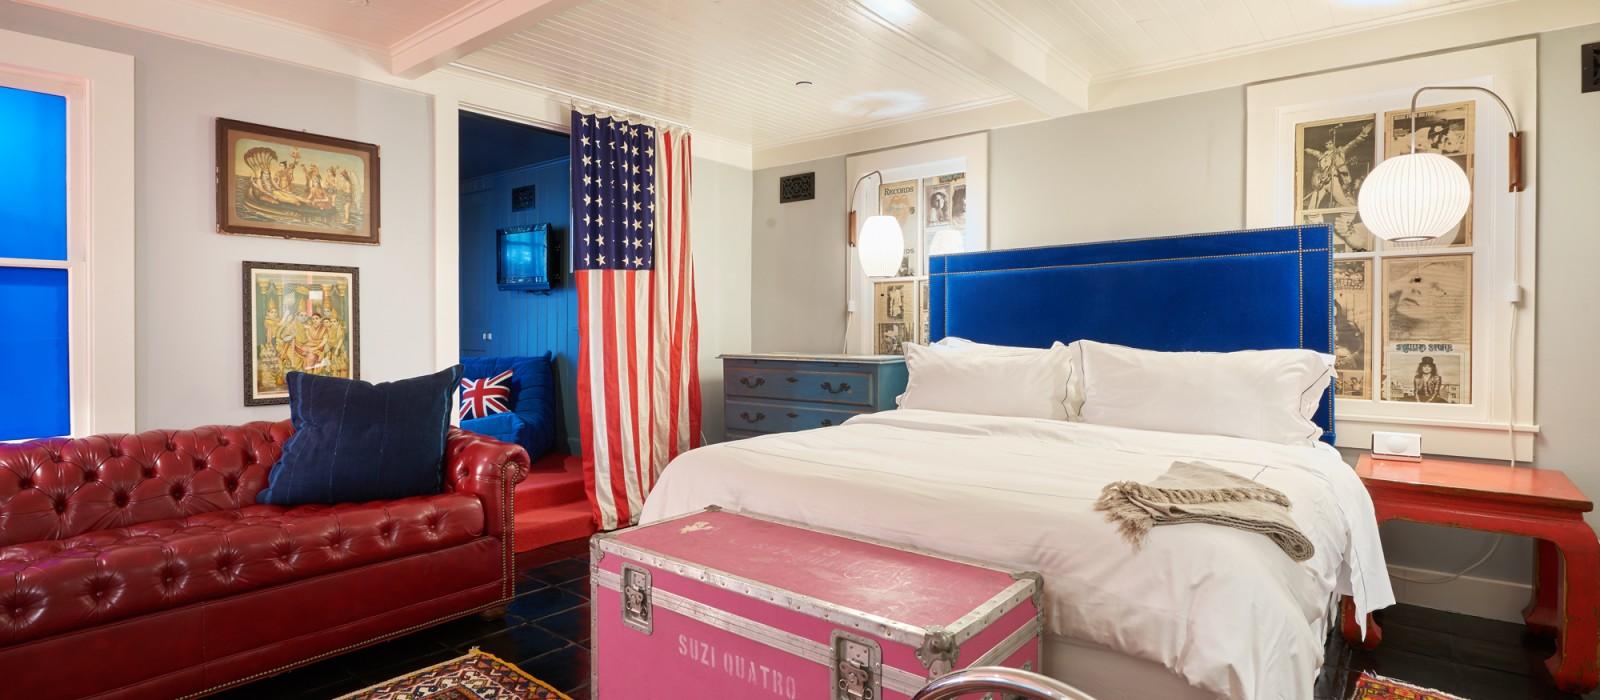 5 suite 5 Hotel Saint Cecilia Austin Texas interior design vintage apartment ciekawe wnetrza hotelowe styl amerykanski